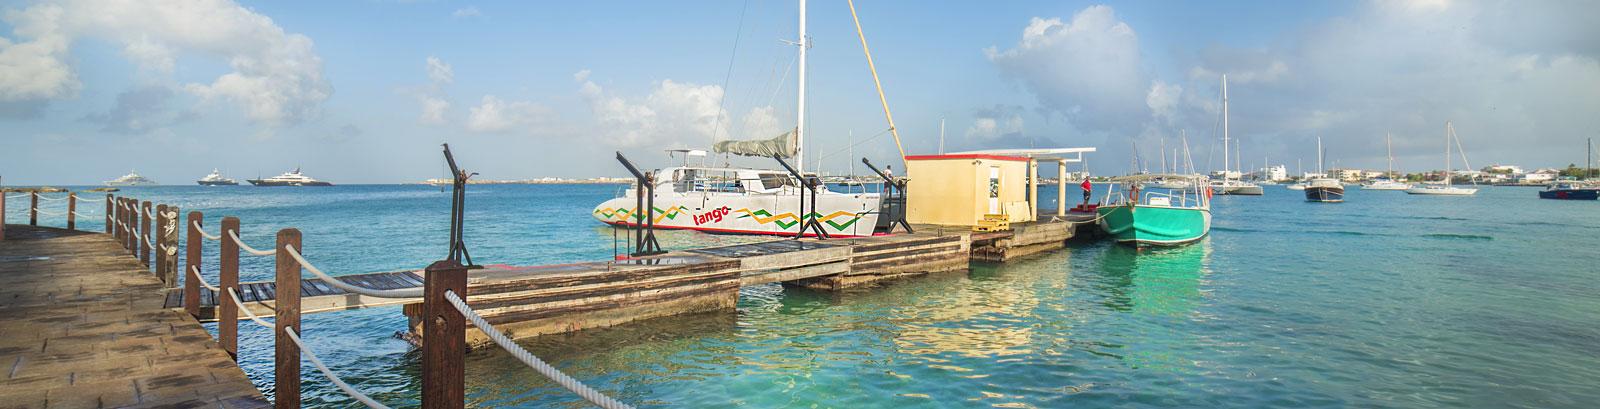 Aqua Mania Adventures and Water Sports, Simpson Bay Resort, Marina & Spa